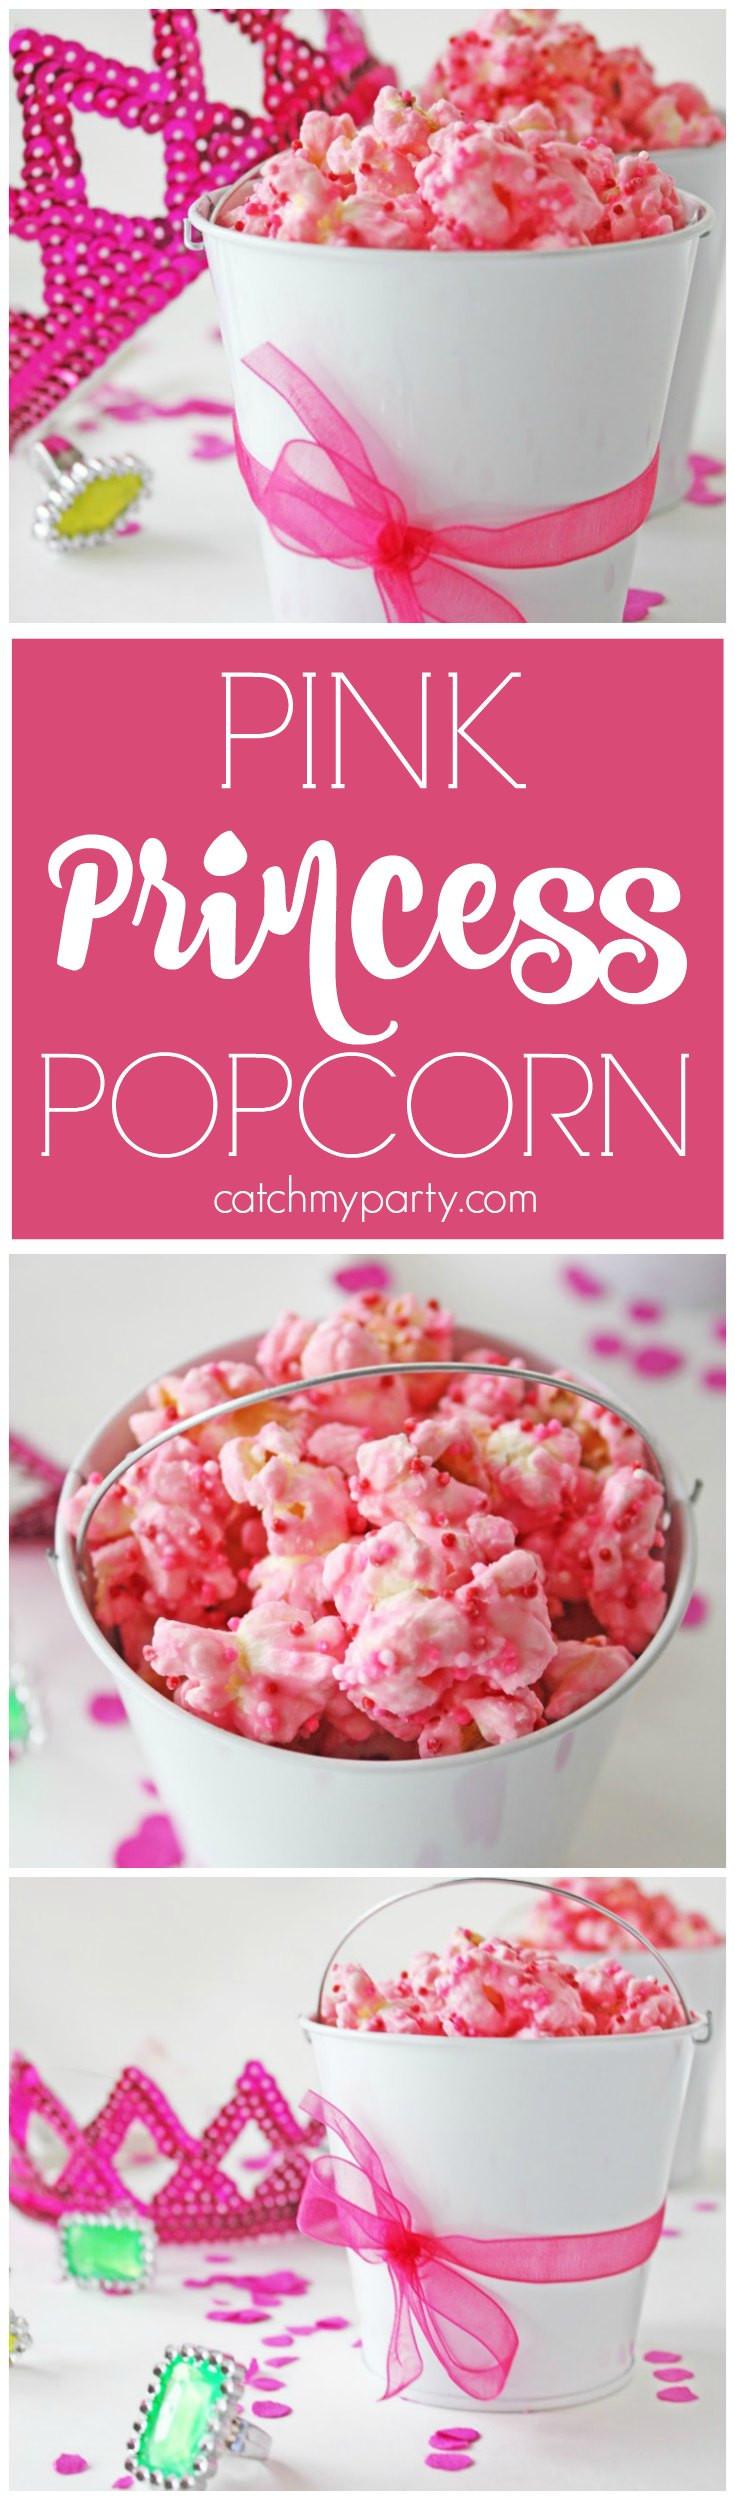 Pink Party Food Ideas  Pink Princess Popcorn